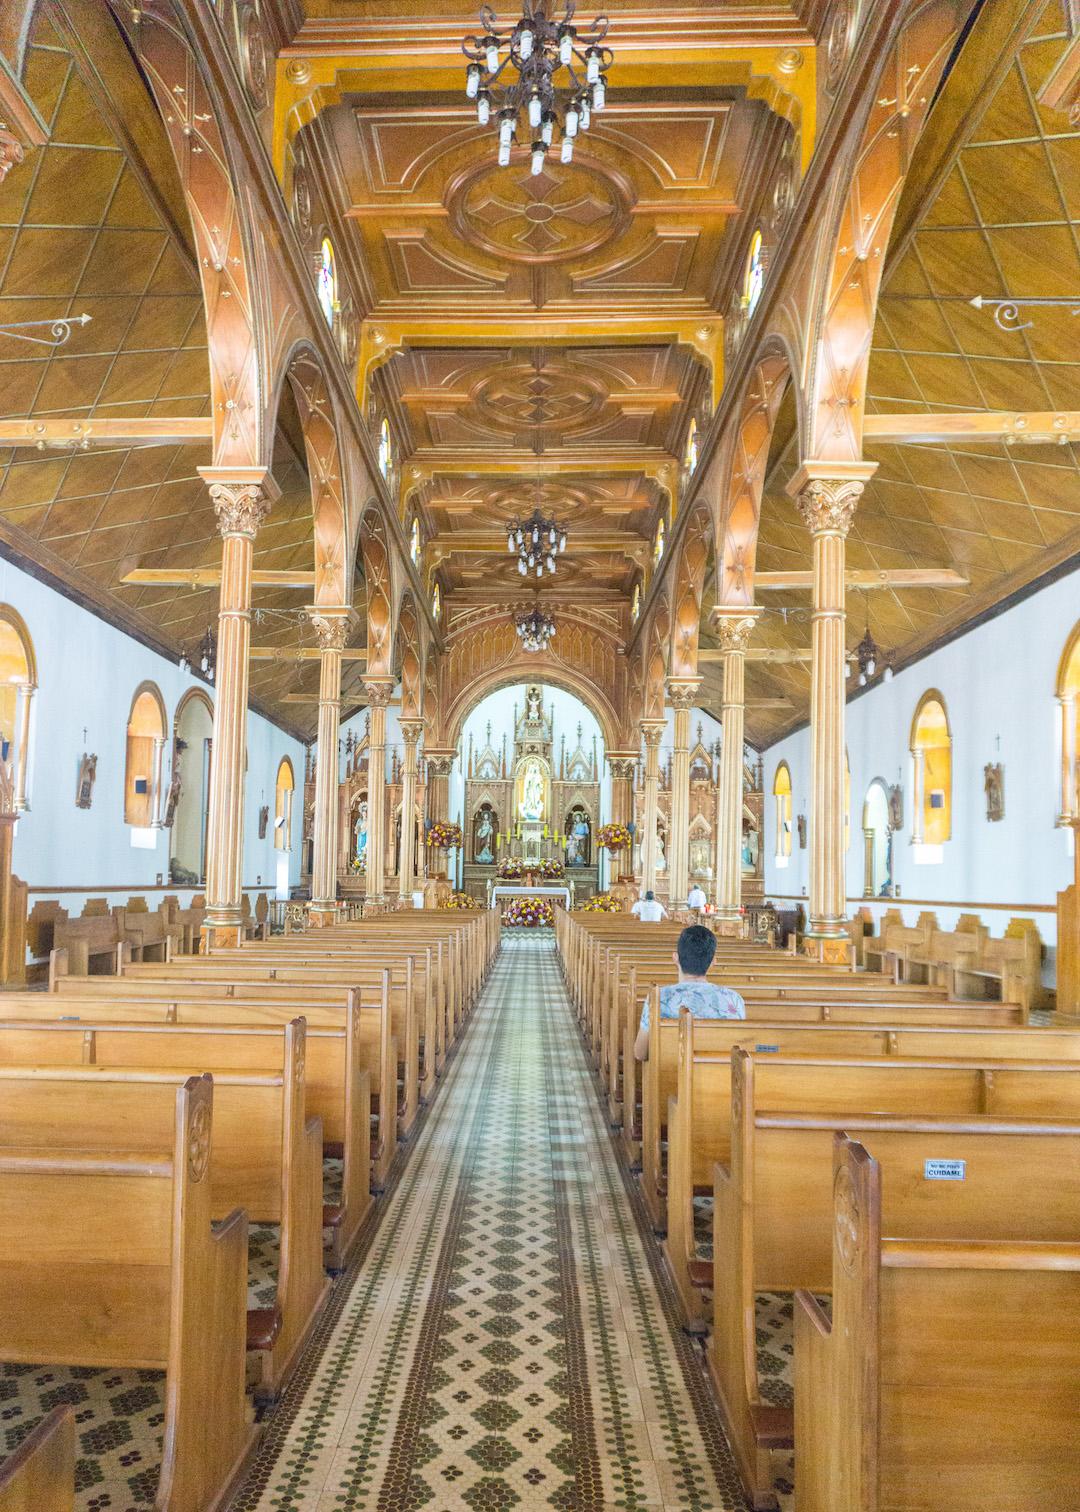 Her_Travel_Edit_Guatape_Church_Interior